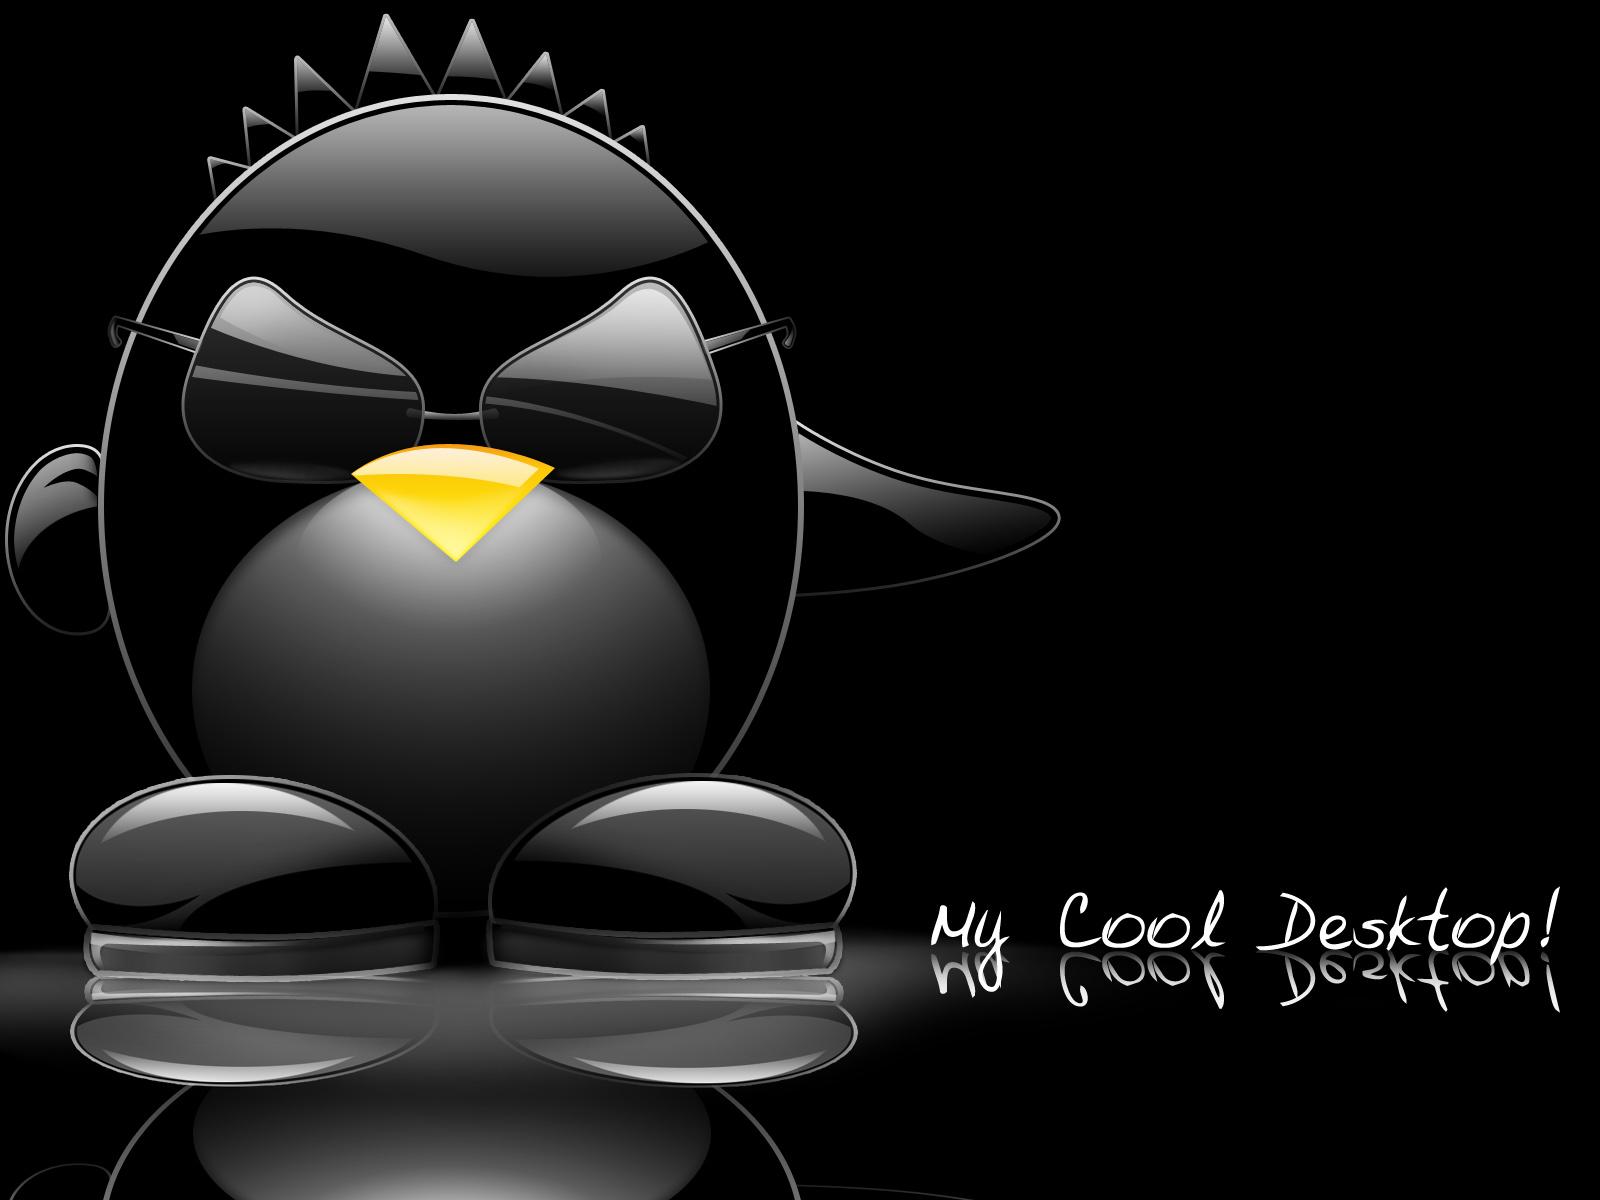 Download My Cool Desktop Wallpaper HD FREE Uploaded by   Amit kumar 1600x1200